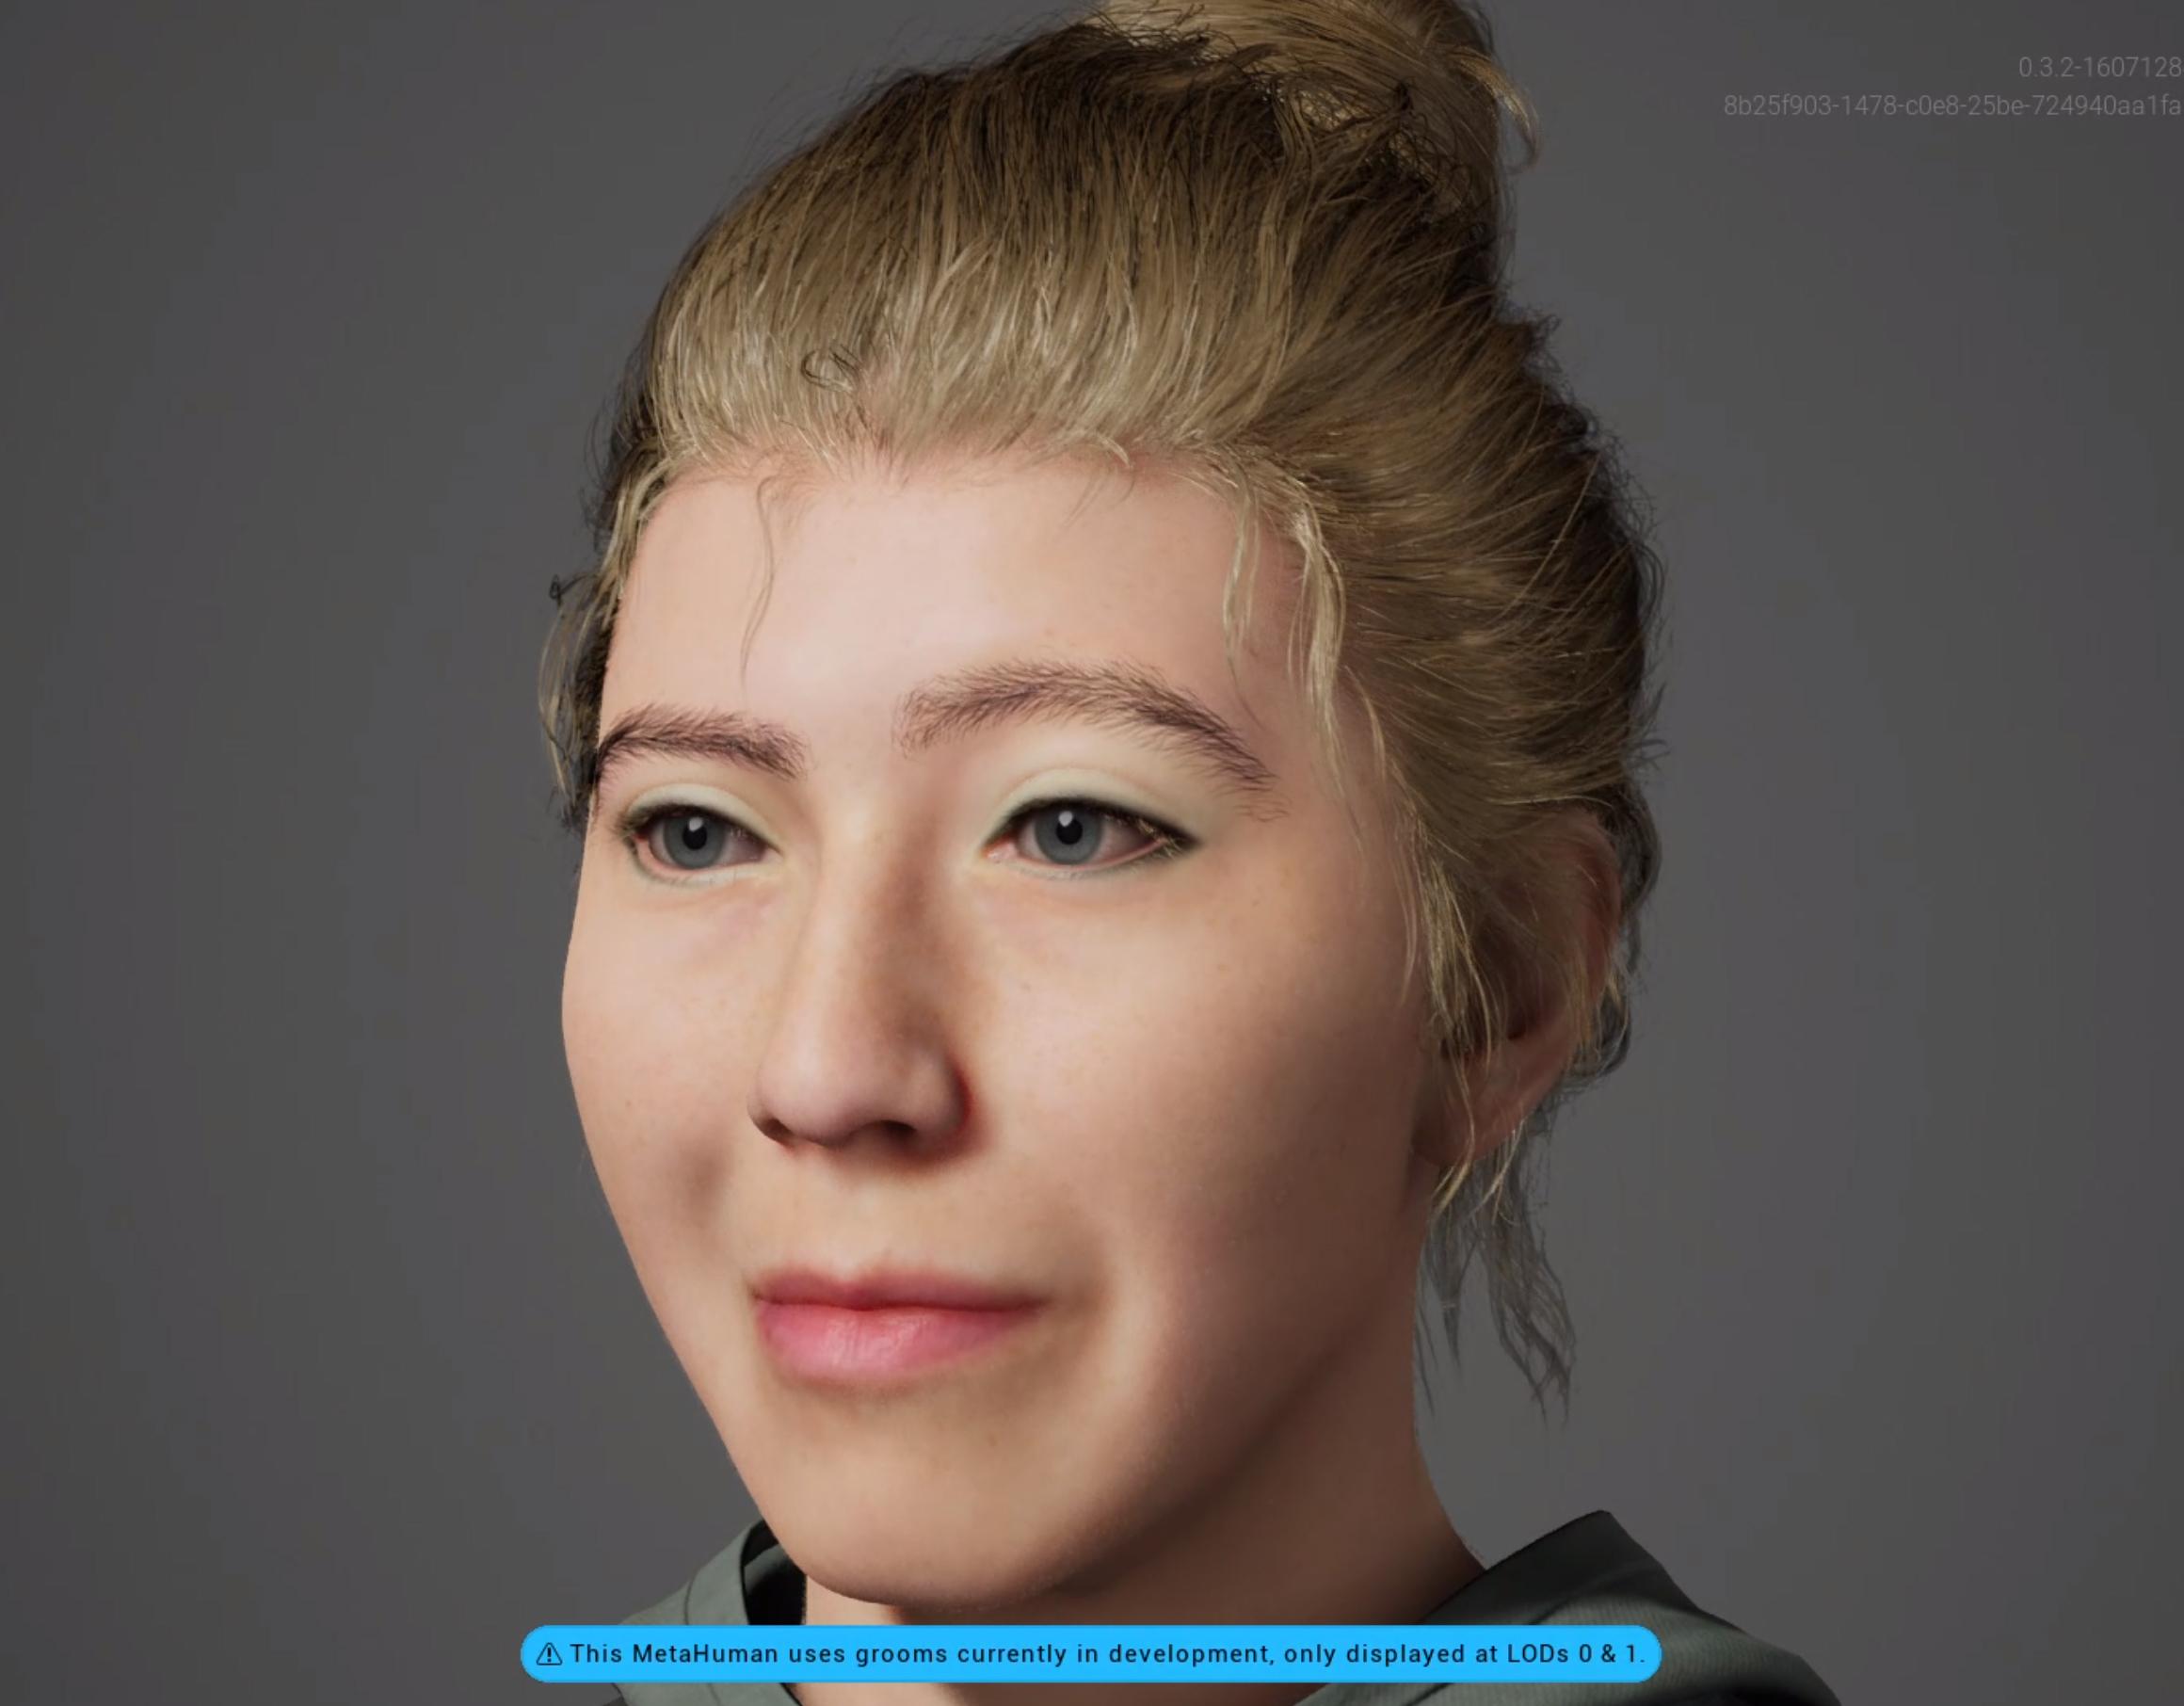 This is Walburga a MetaHuman created with the Unreal Engine Metahuman Creator